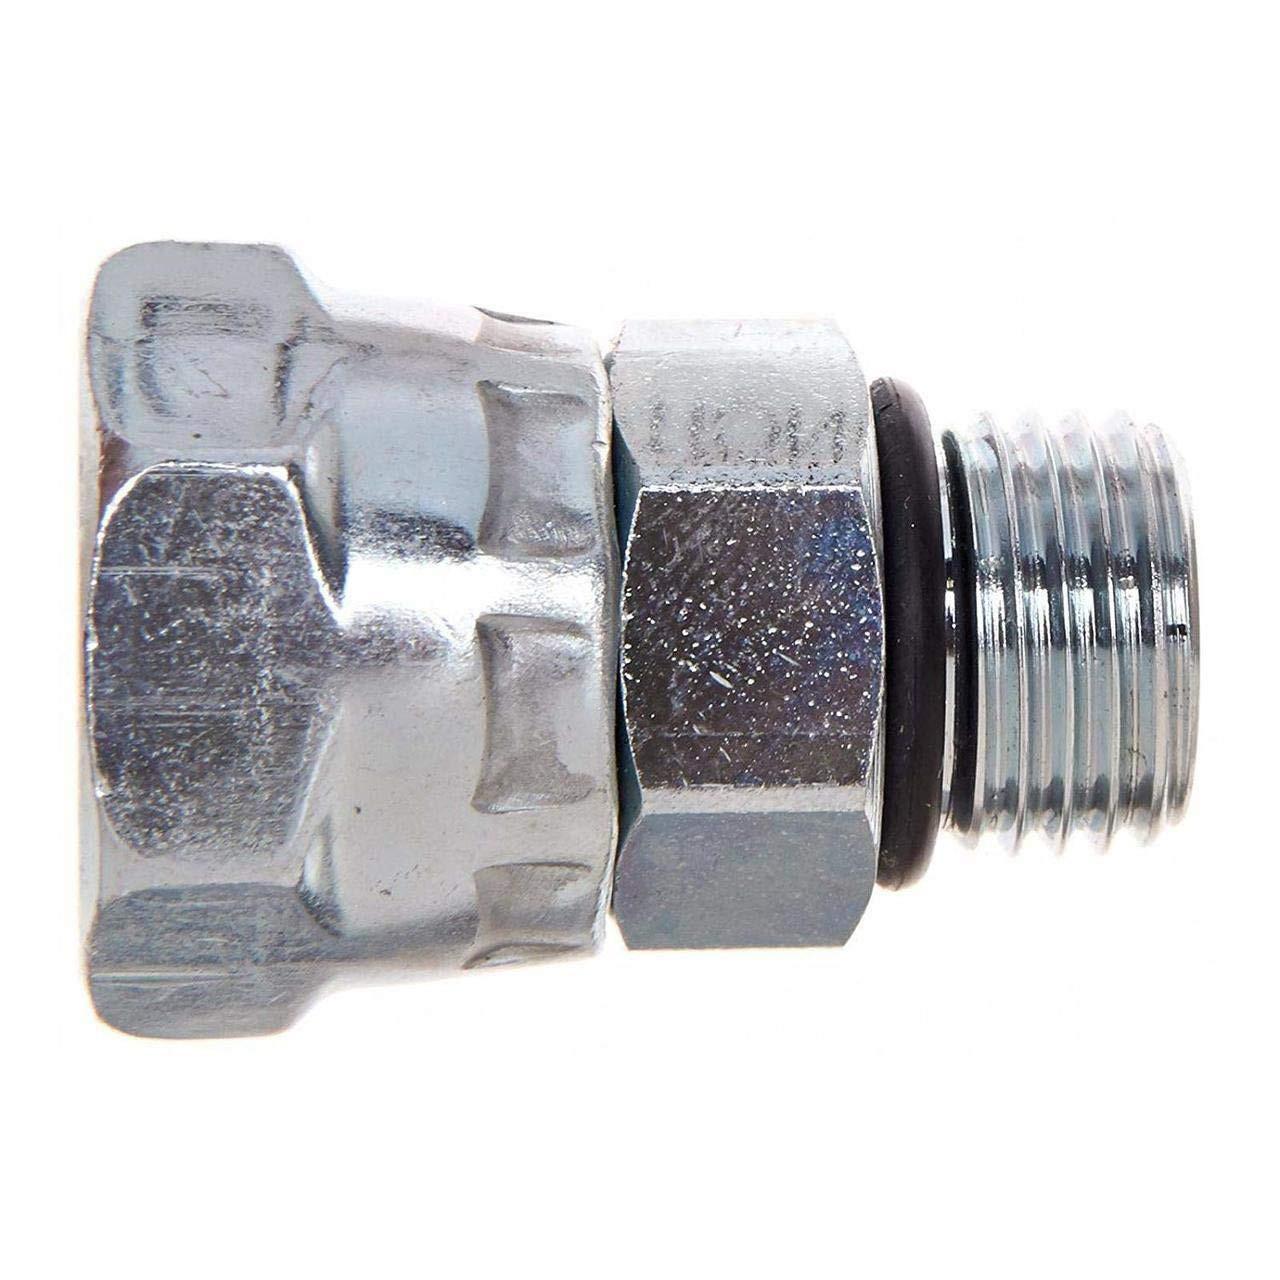 10Mb gates g60285-1008 10mb-8fpx